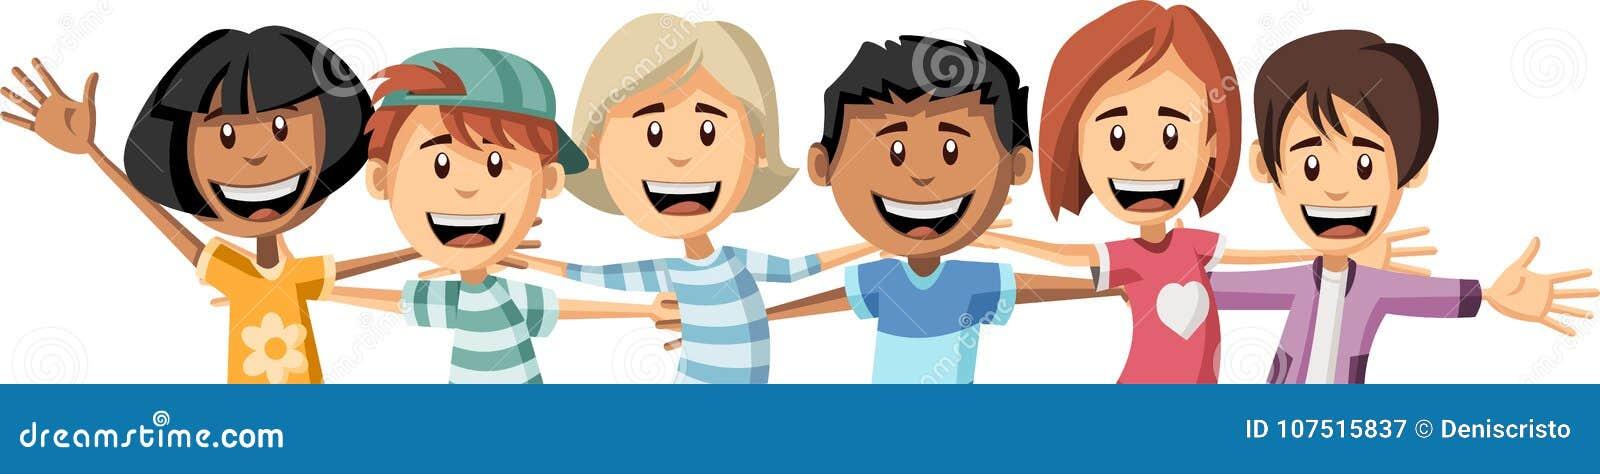 Group Of Happy Cartoon Children Hugging Each Other Stock Vector